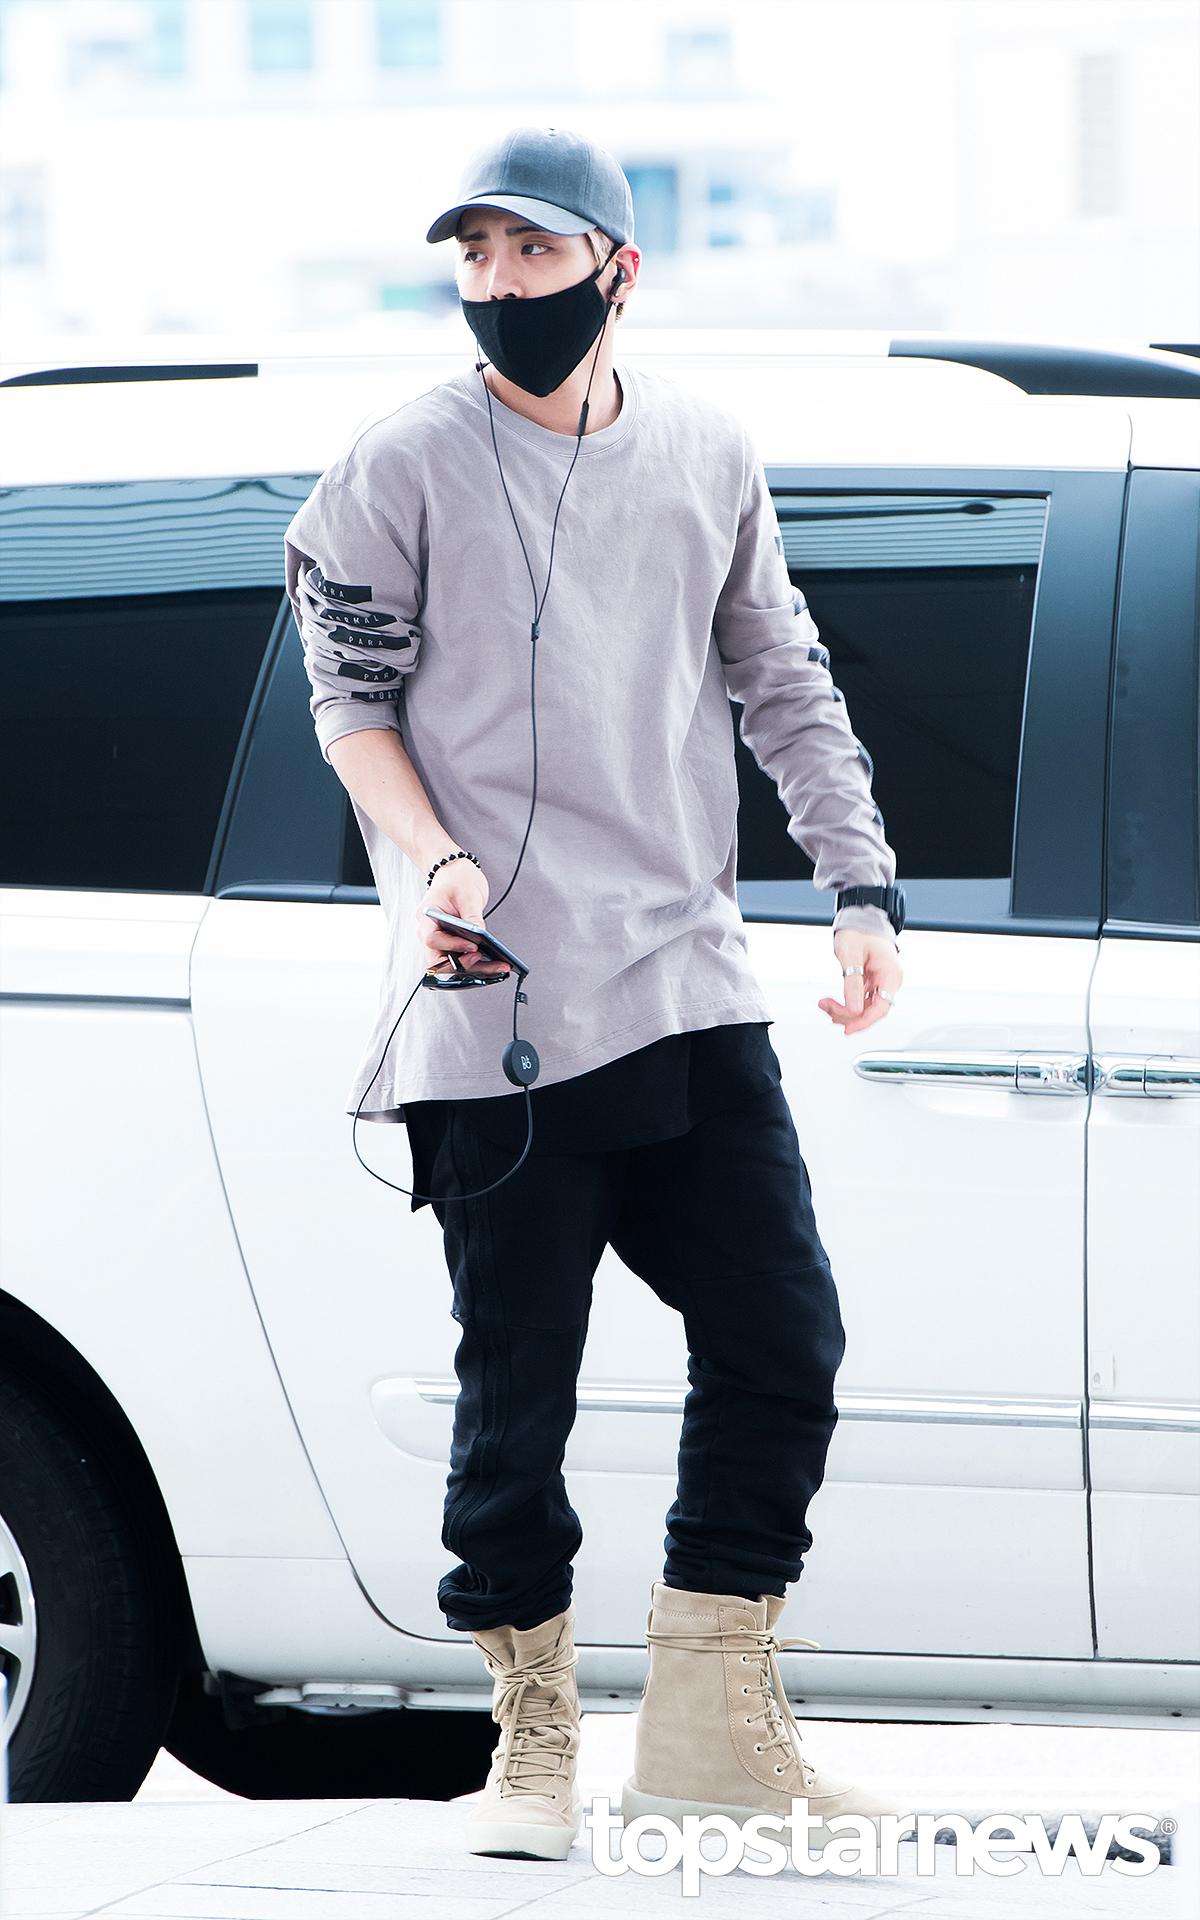 [IMG/160715] Jonghyun, Key @ Aeropuerto Incheon hacia Japón. N7Zk7DMw